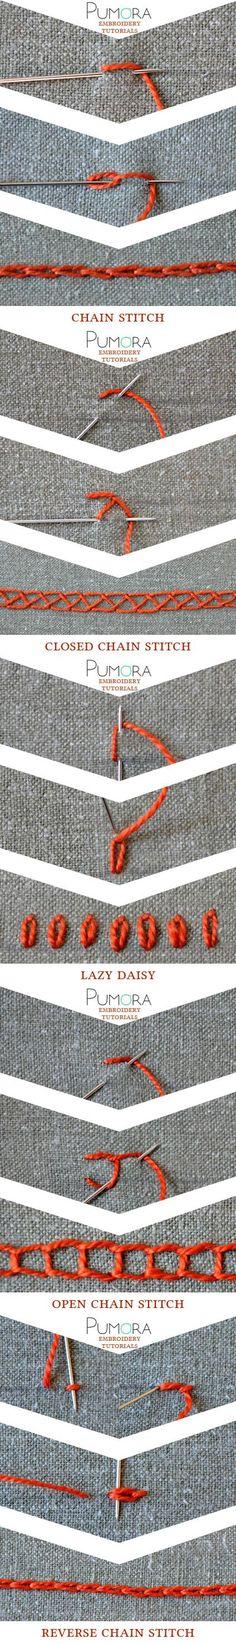 embroidery tutorials: chain stitch with variations broderie, ricamo, sticken…